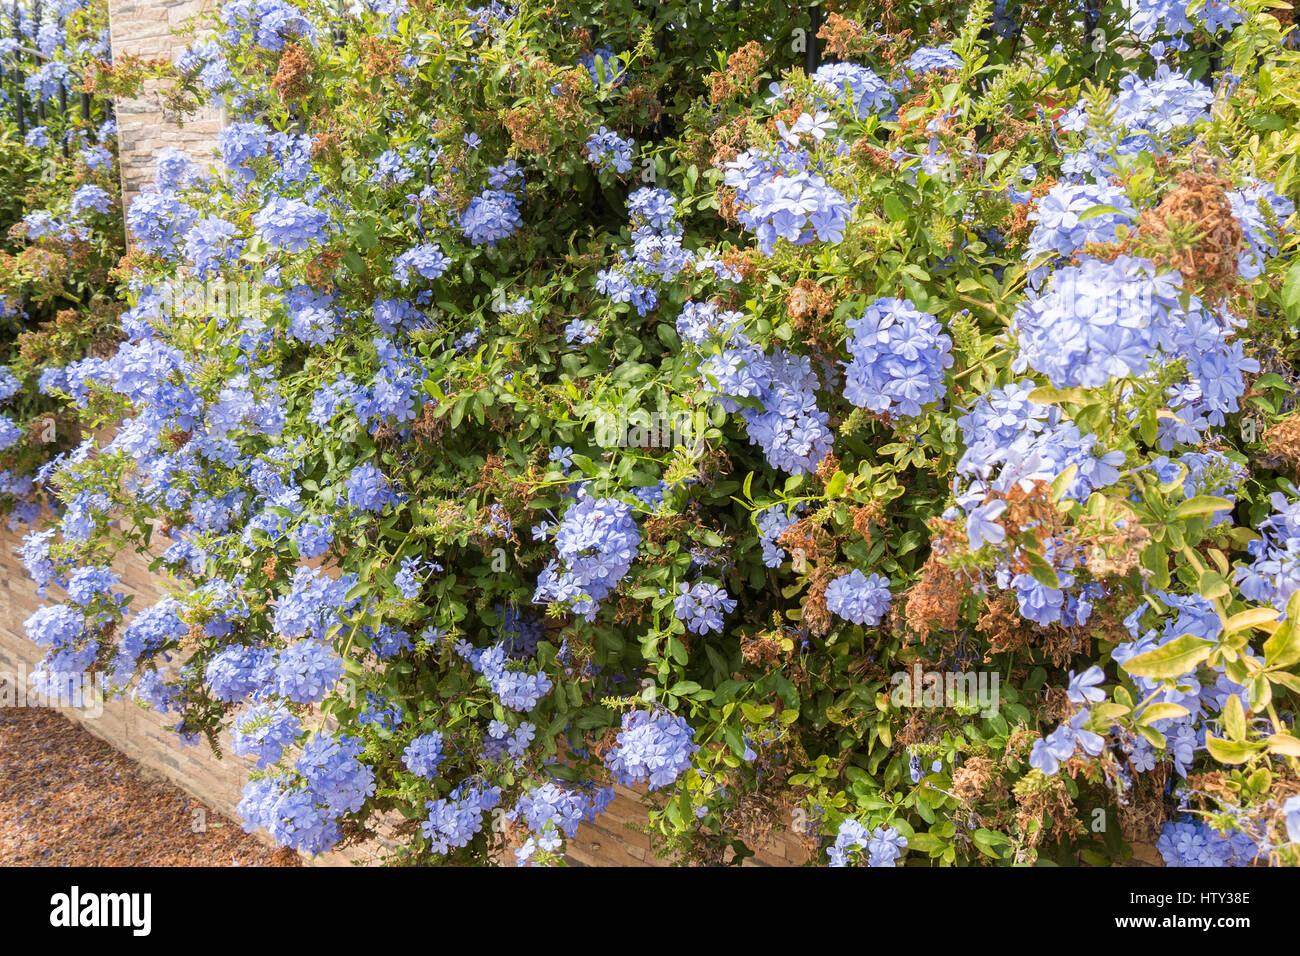 Blue plumbago leadwort flowers stock photos blue plumbago leadwort blue flowers plumbago auriculata cape leadwort blue jasmine stock image izmirmasajfo